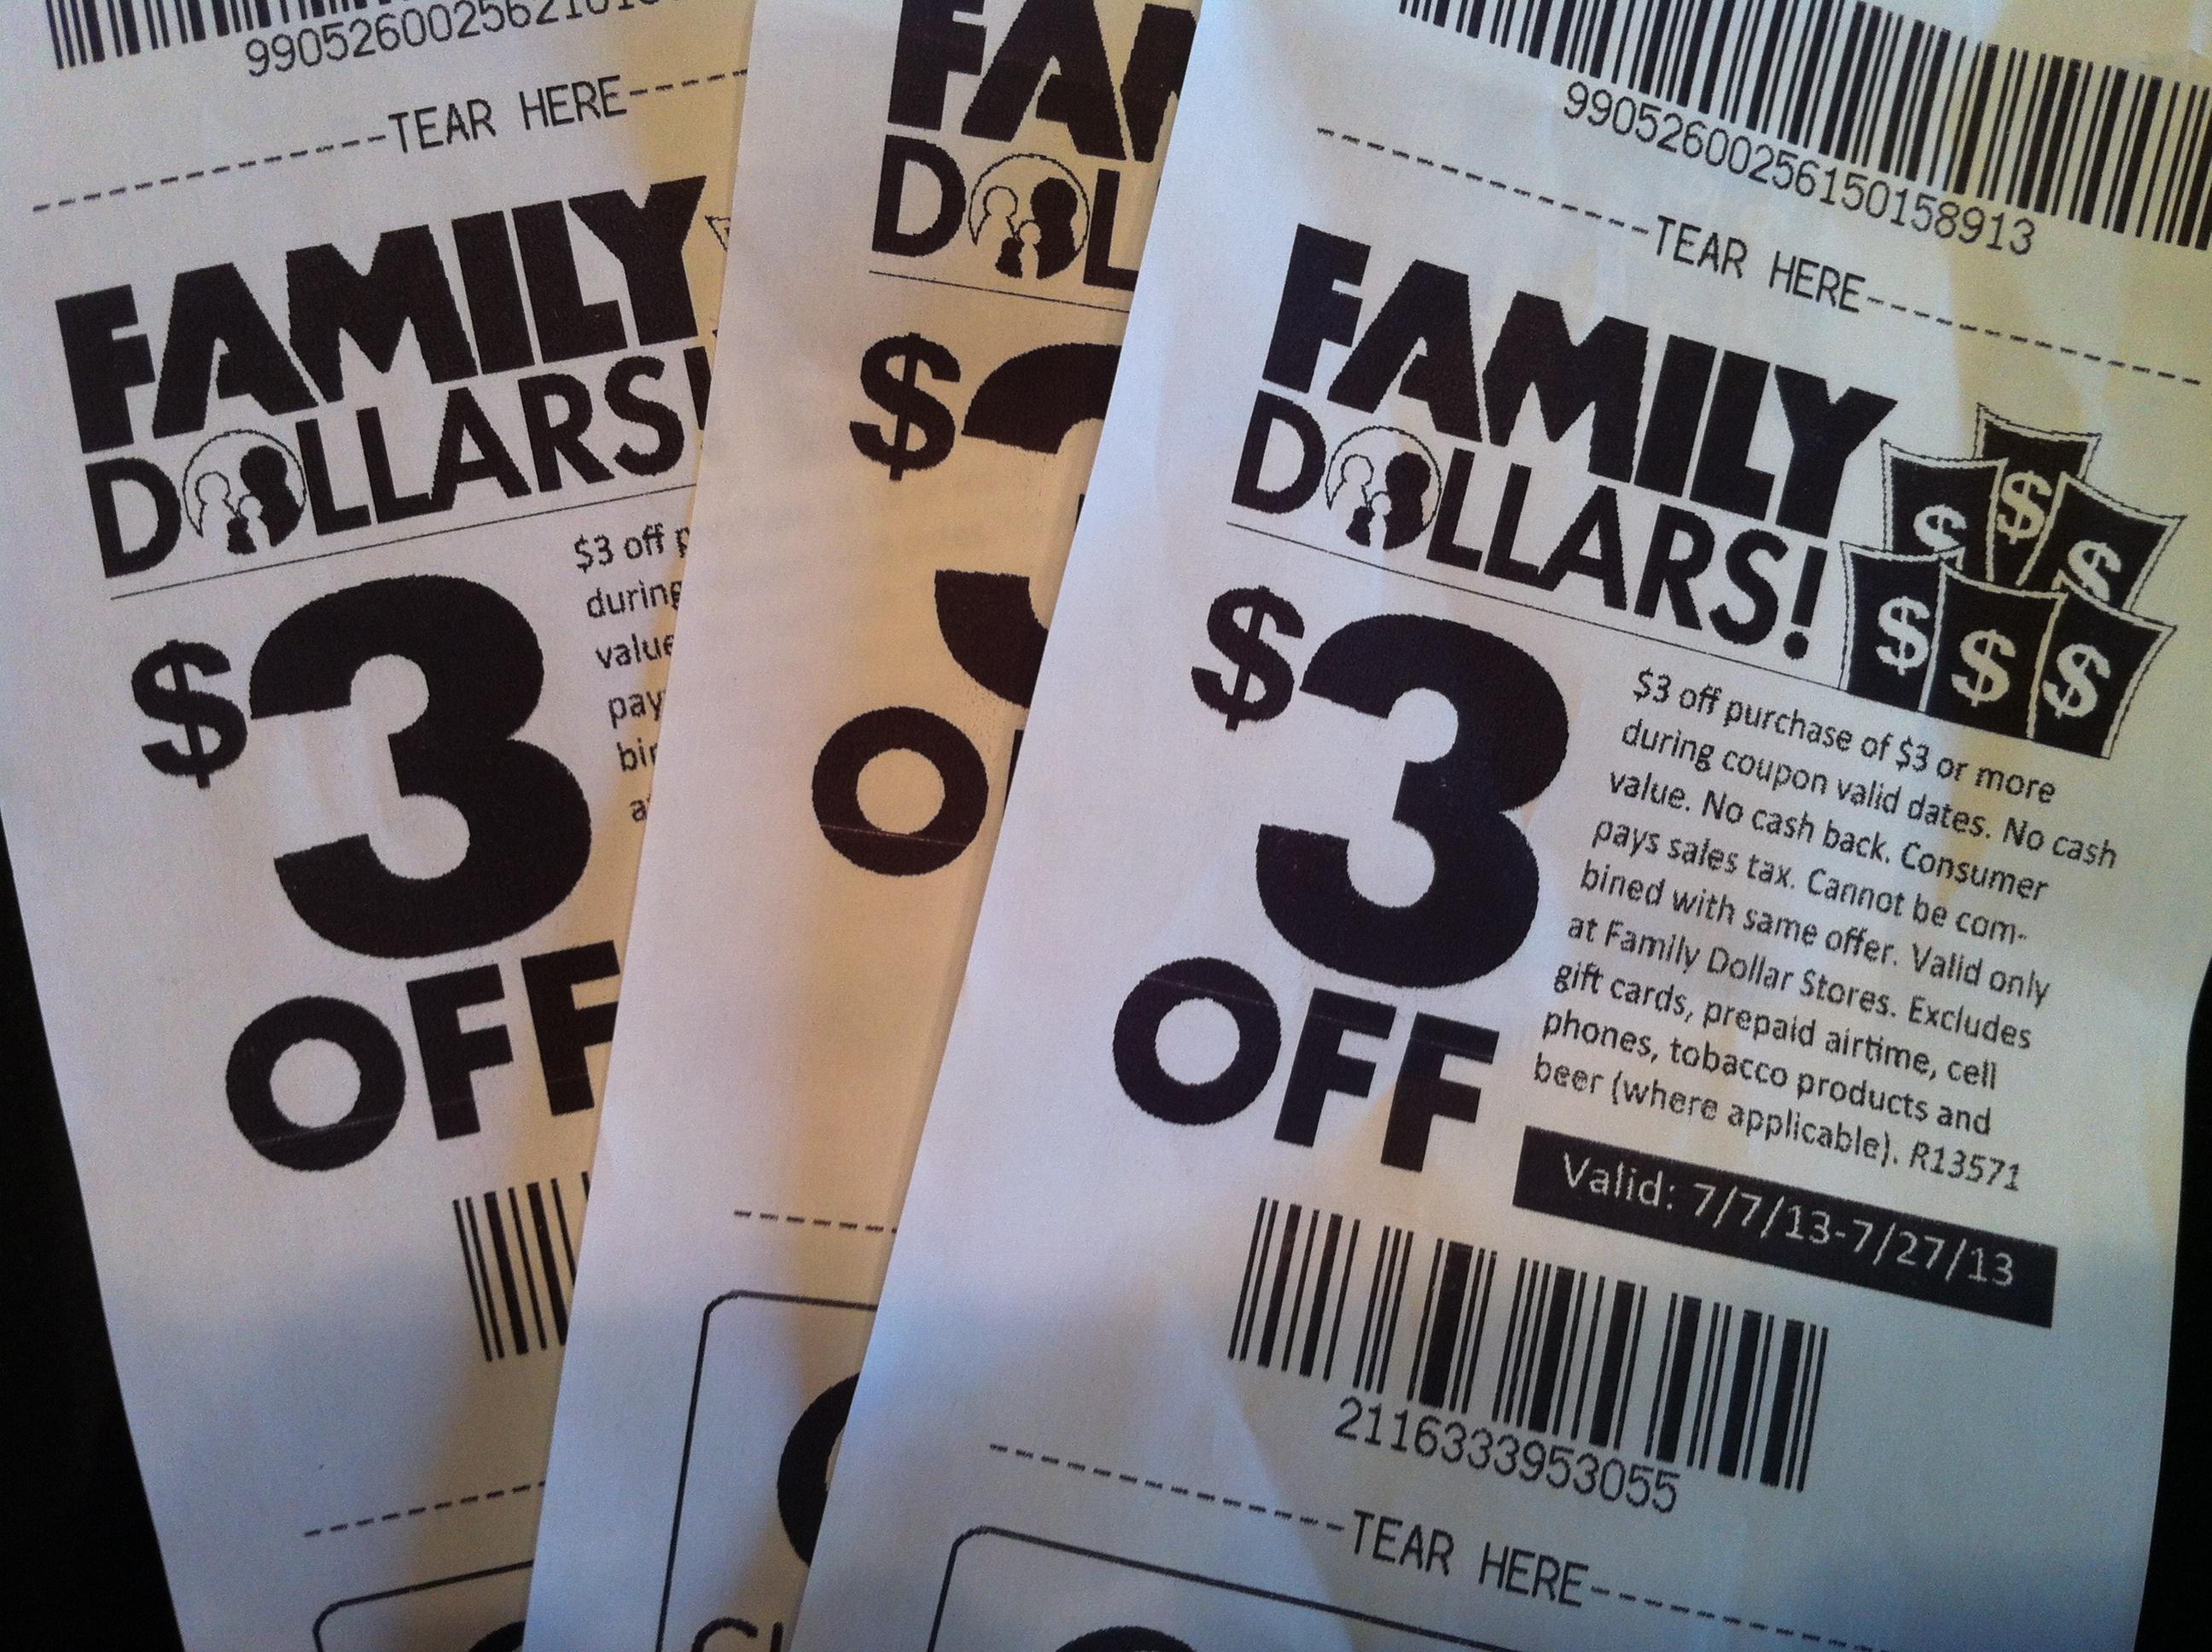 Family dollar family dollars deals free jello mylitter one